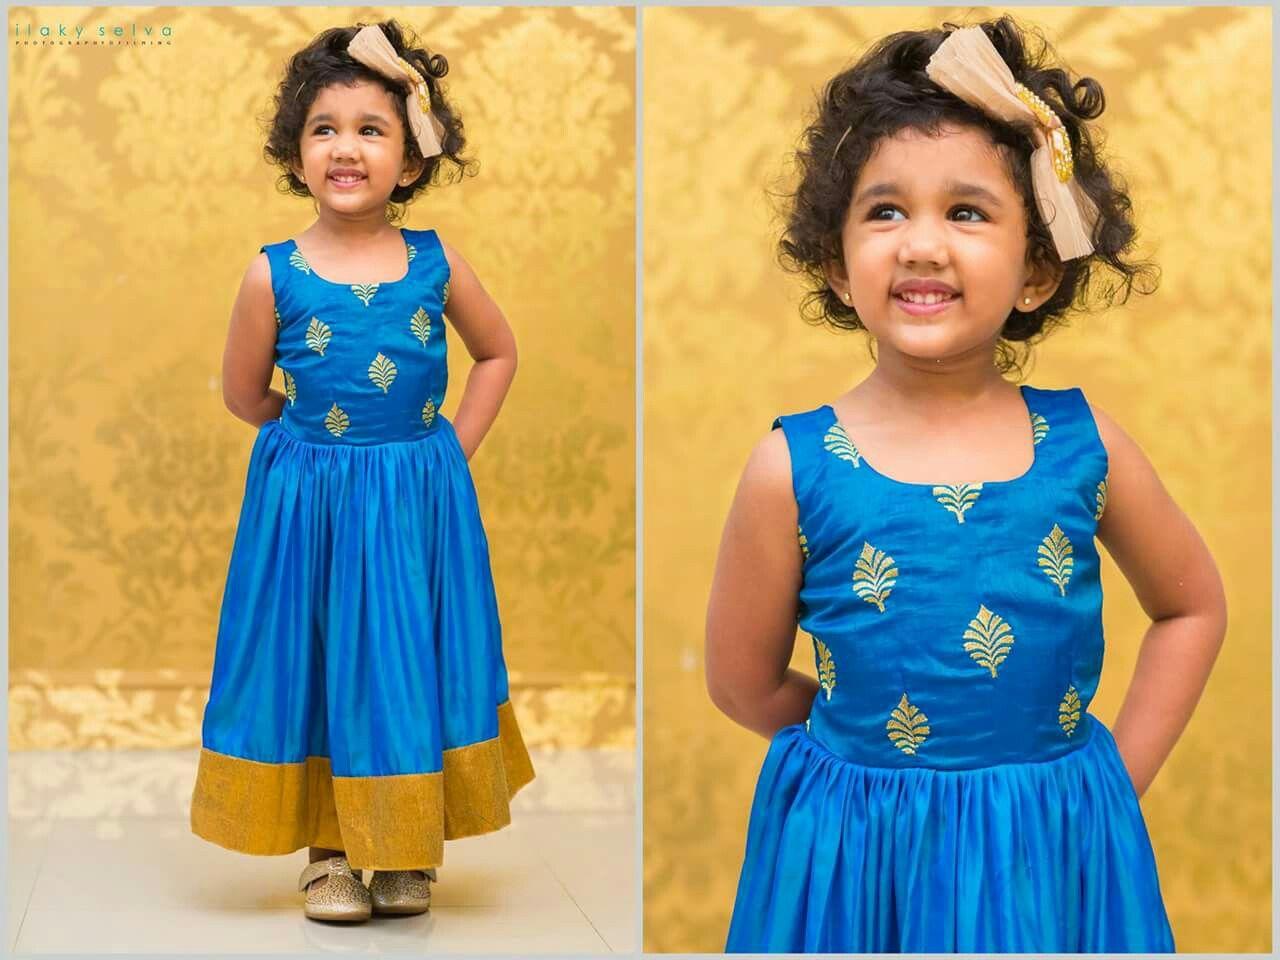 Pin by deepa sravanthi on simple sewing pinterest kid clothing